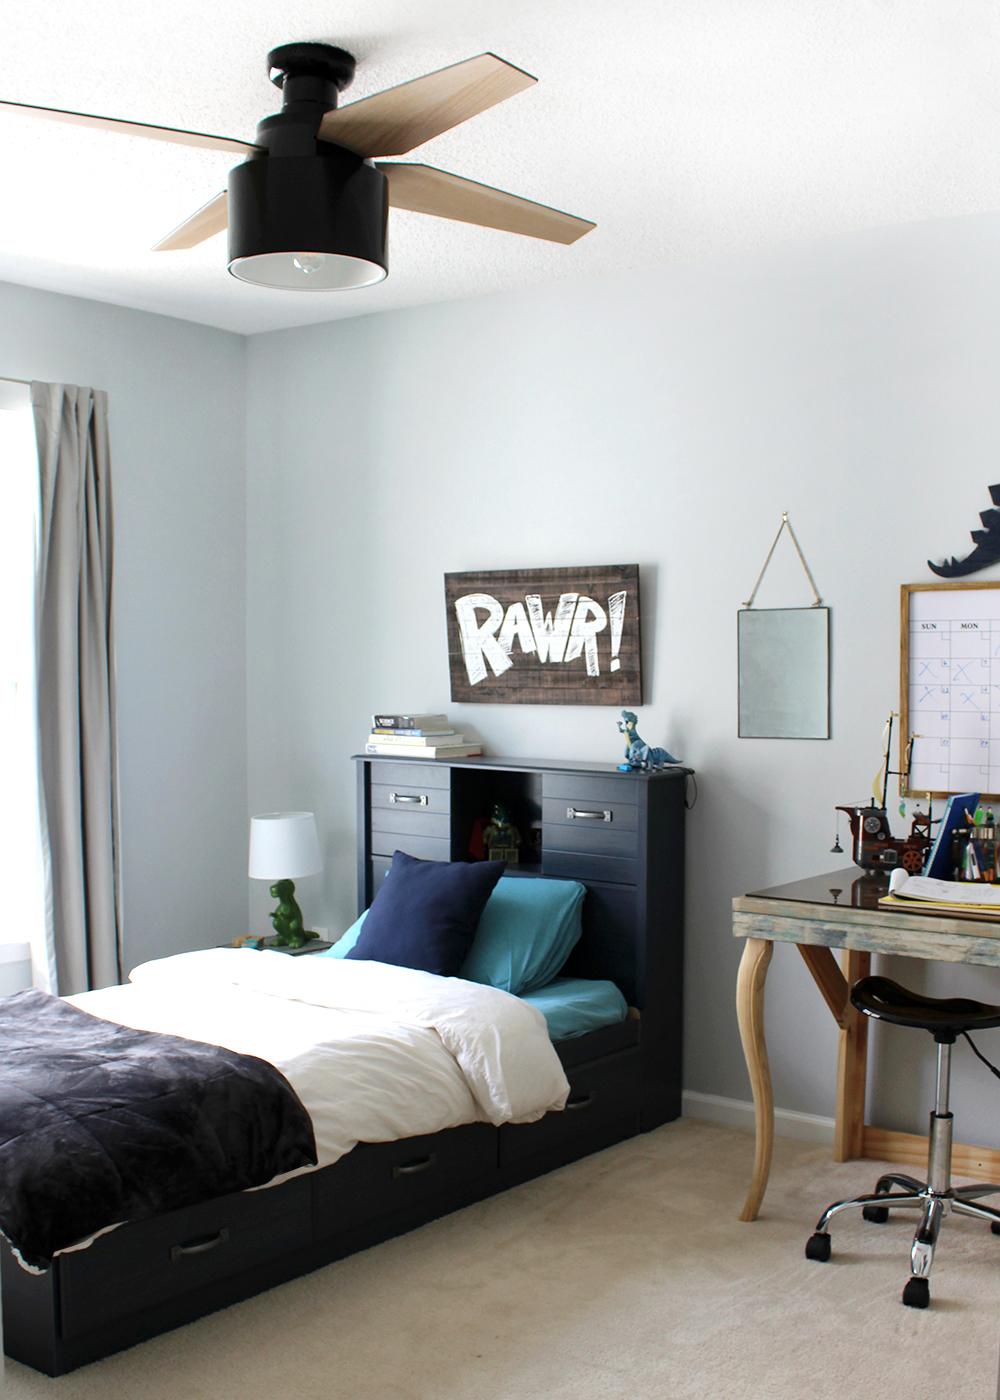 preteen boy room with blue walls and a modern black ceiling fan #kidsroom #kidsbedroom #teenroom #preteenroom